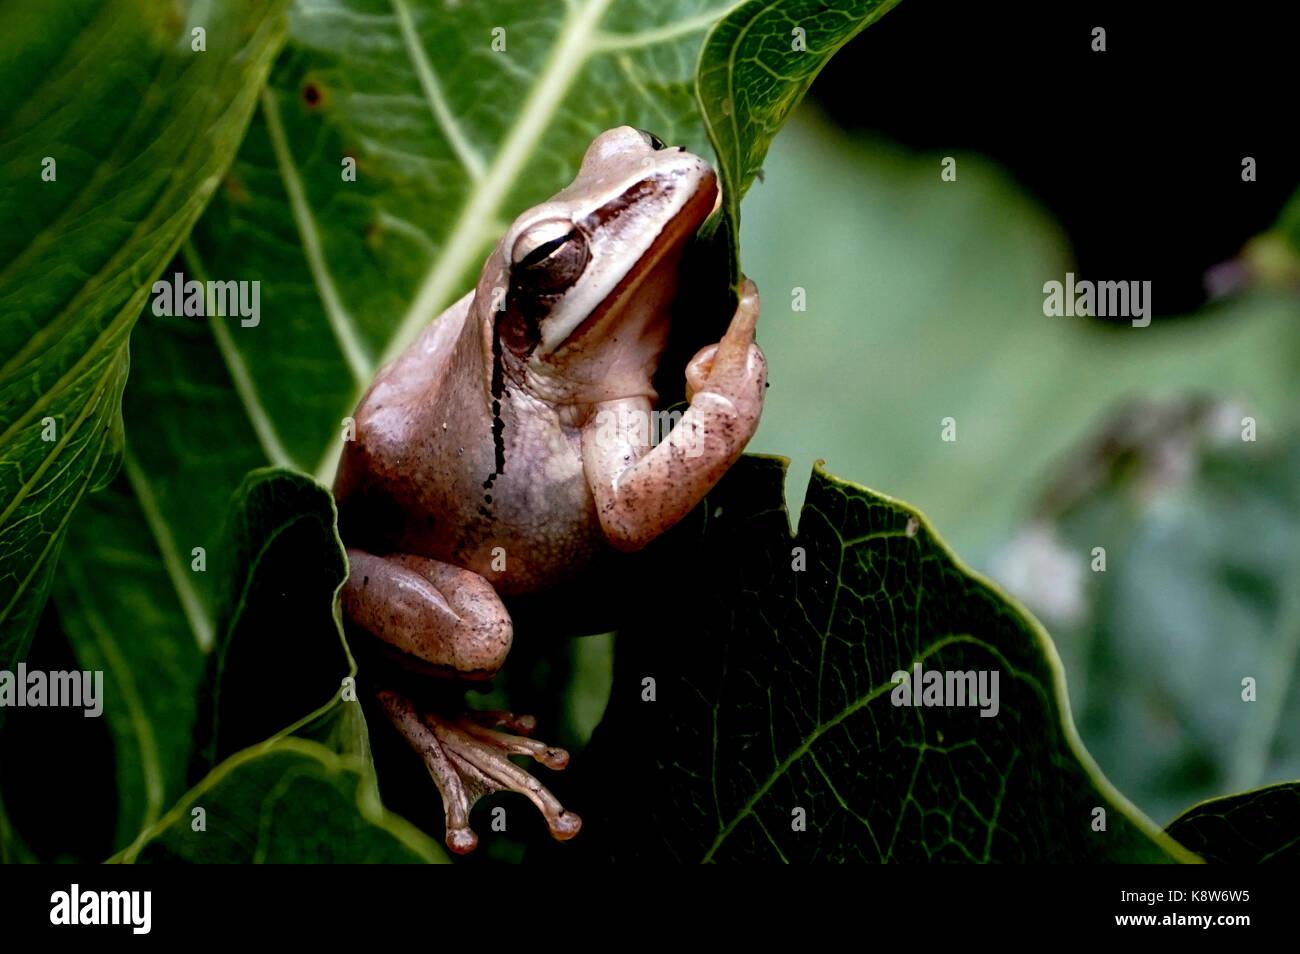 A Sleeping Tree Frog - Stock Image